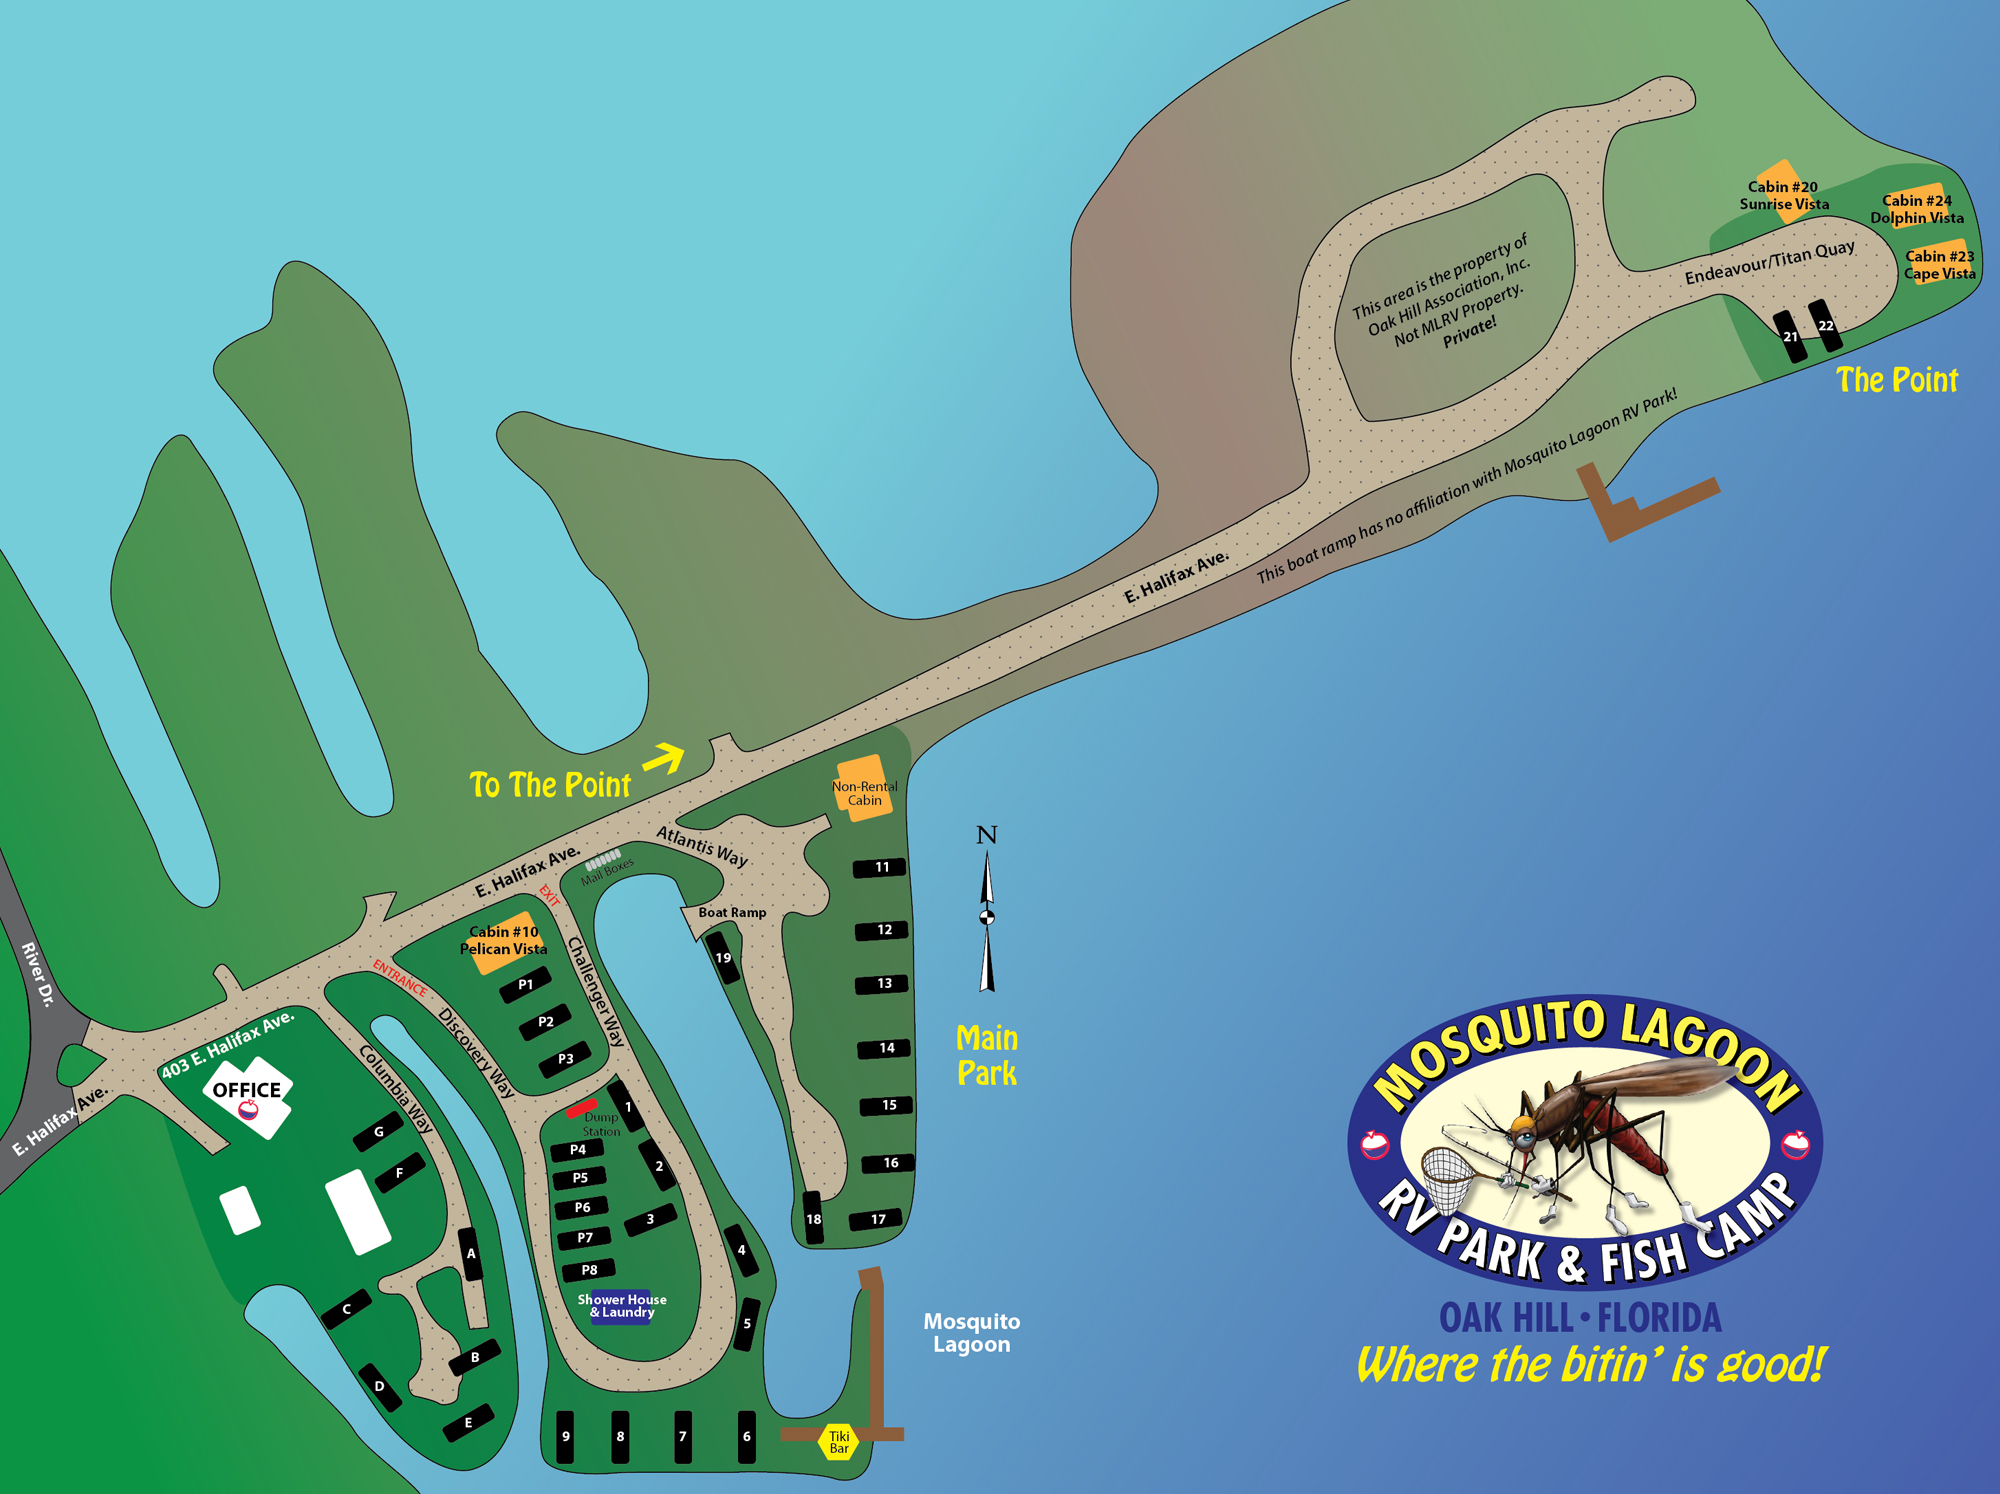 Mosquito Lagoon RV Park Maps - Mosquito Lagoon RV Park and